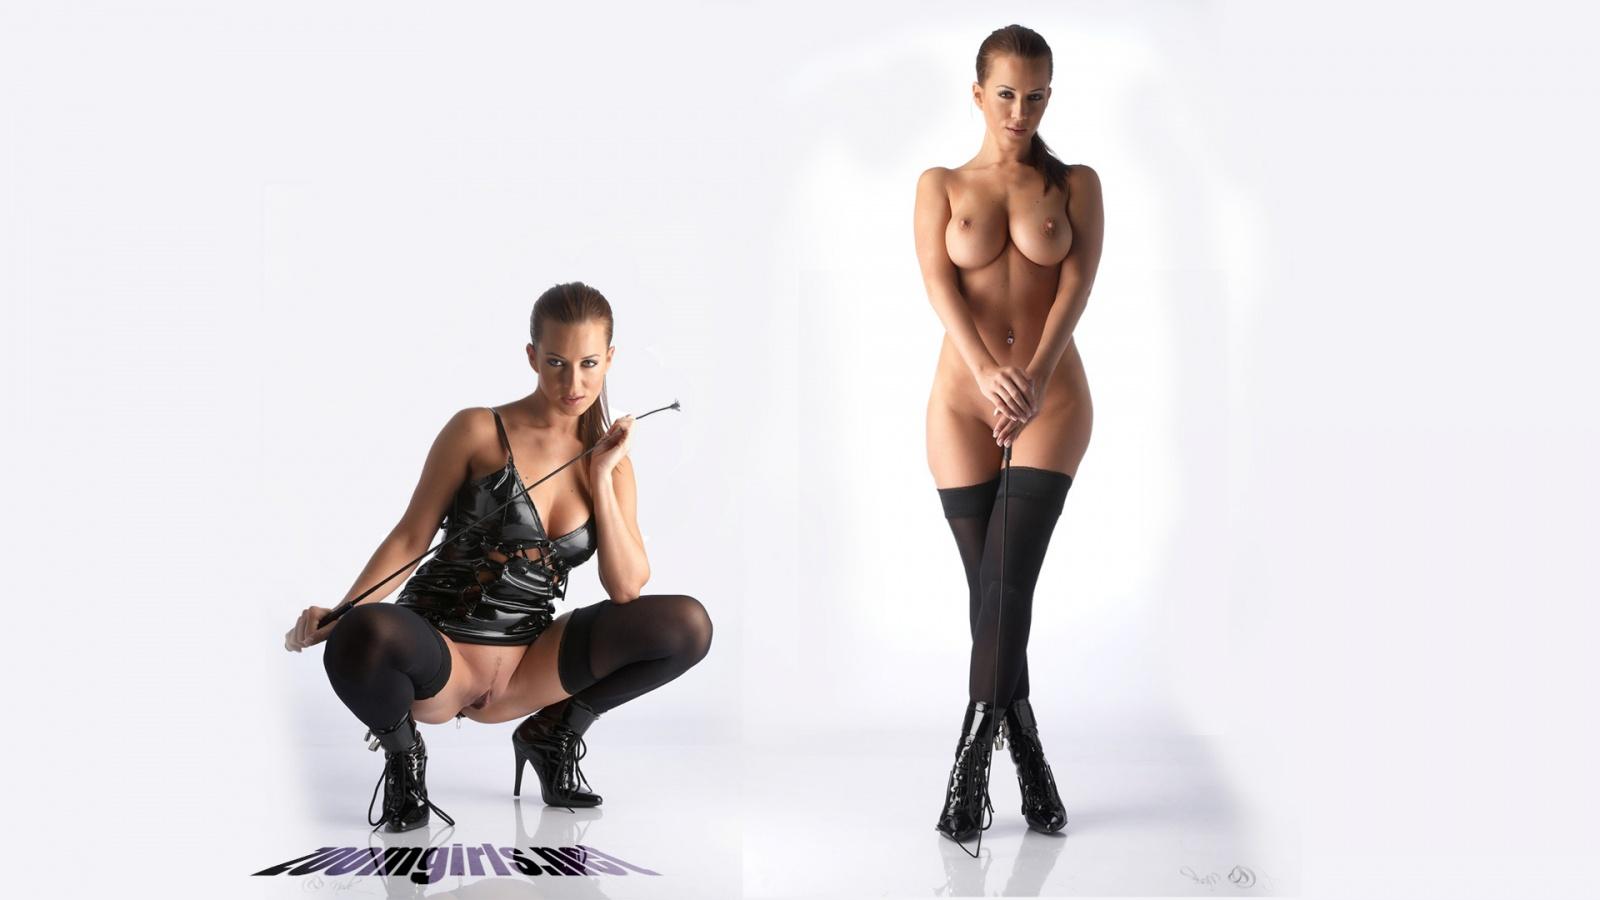 erotika-hd